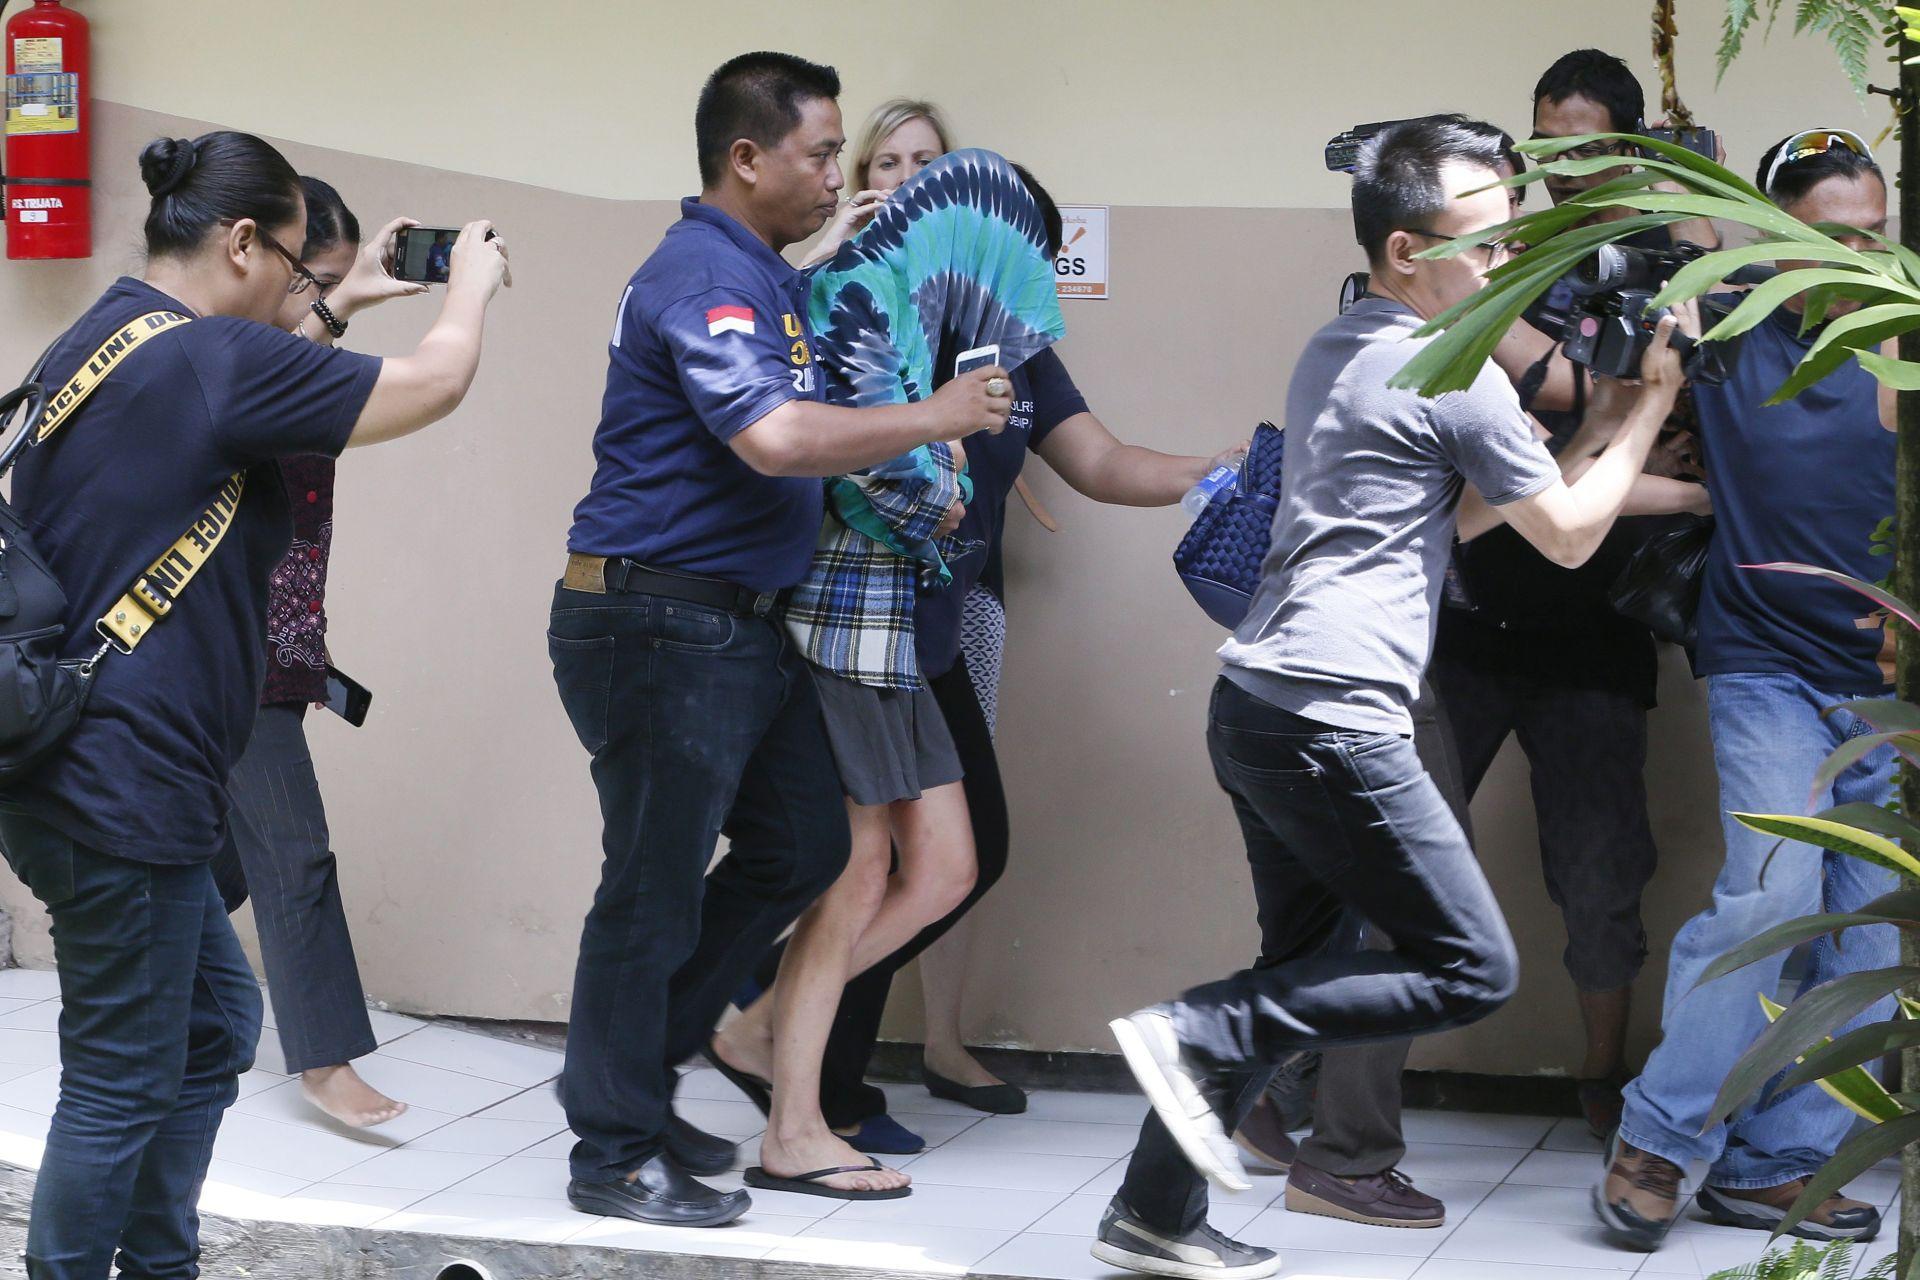 BOMBE ZAKAZALE: U Indoneziji muškarac sa zastavom IS-a napao policiju